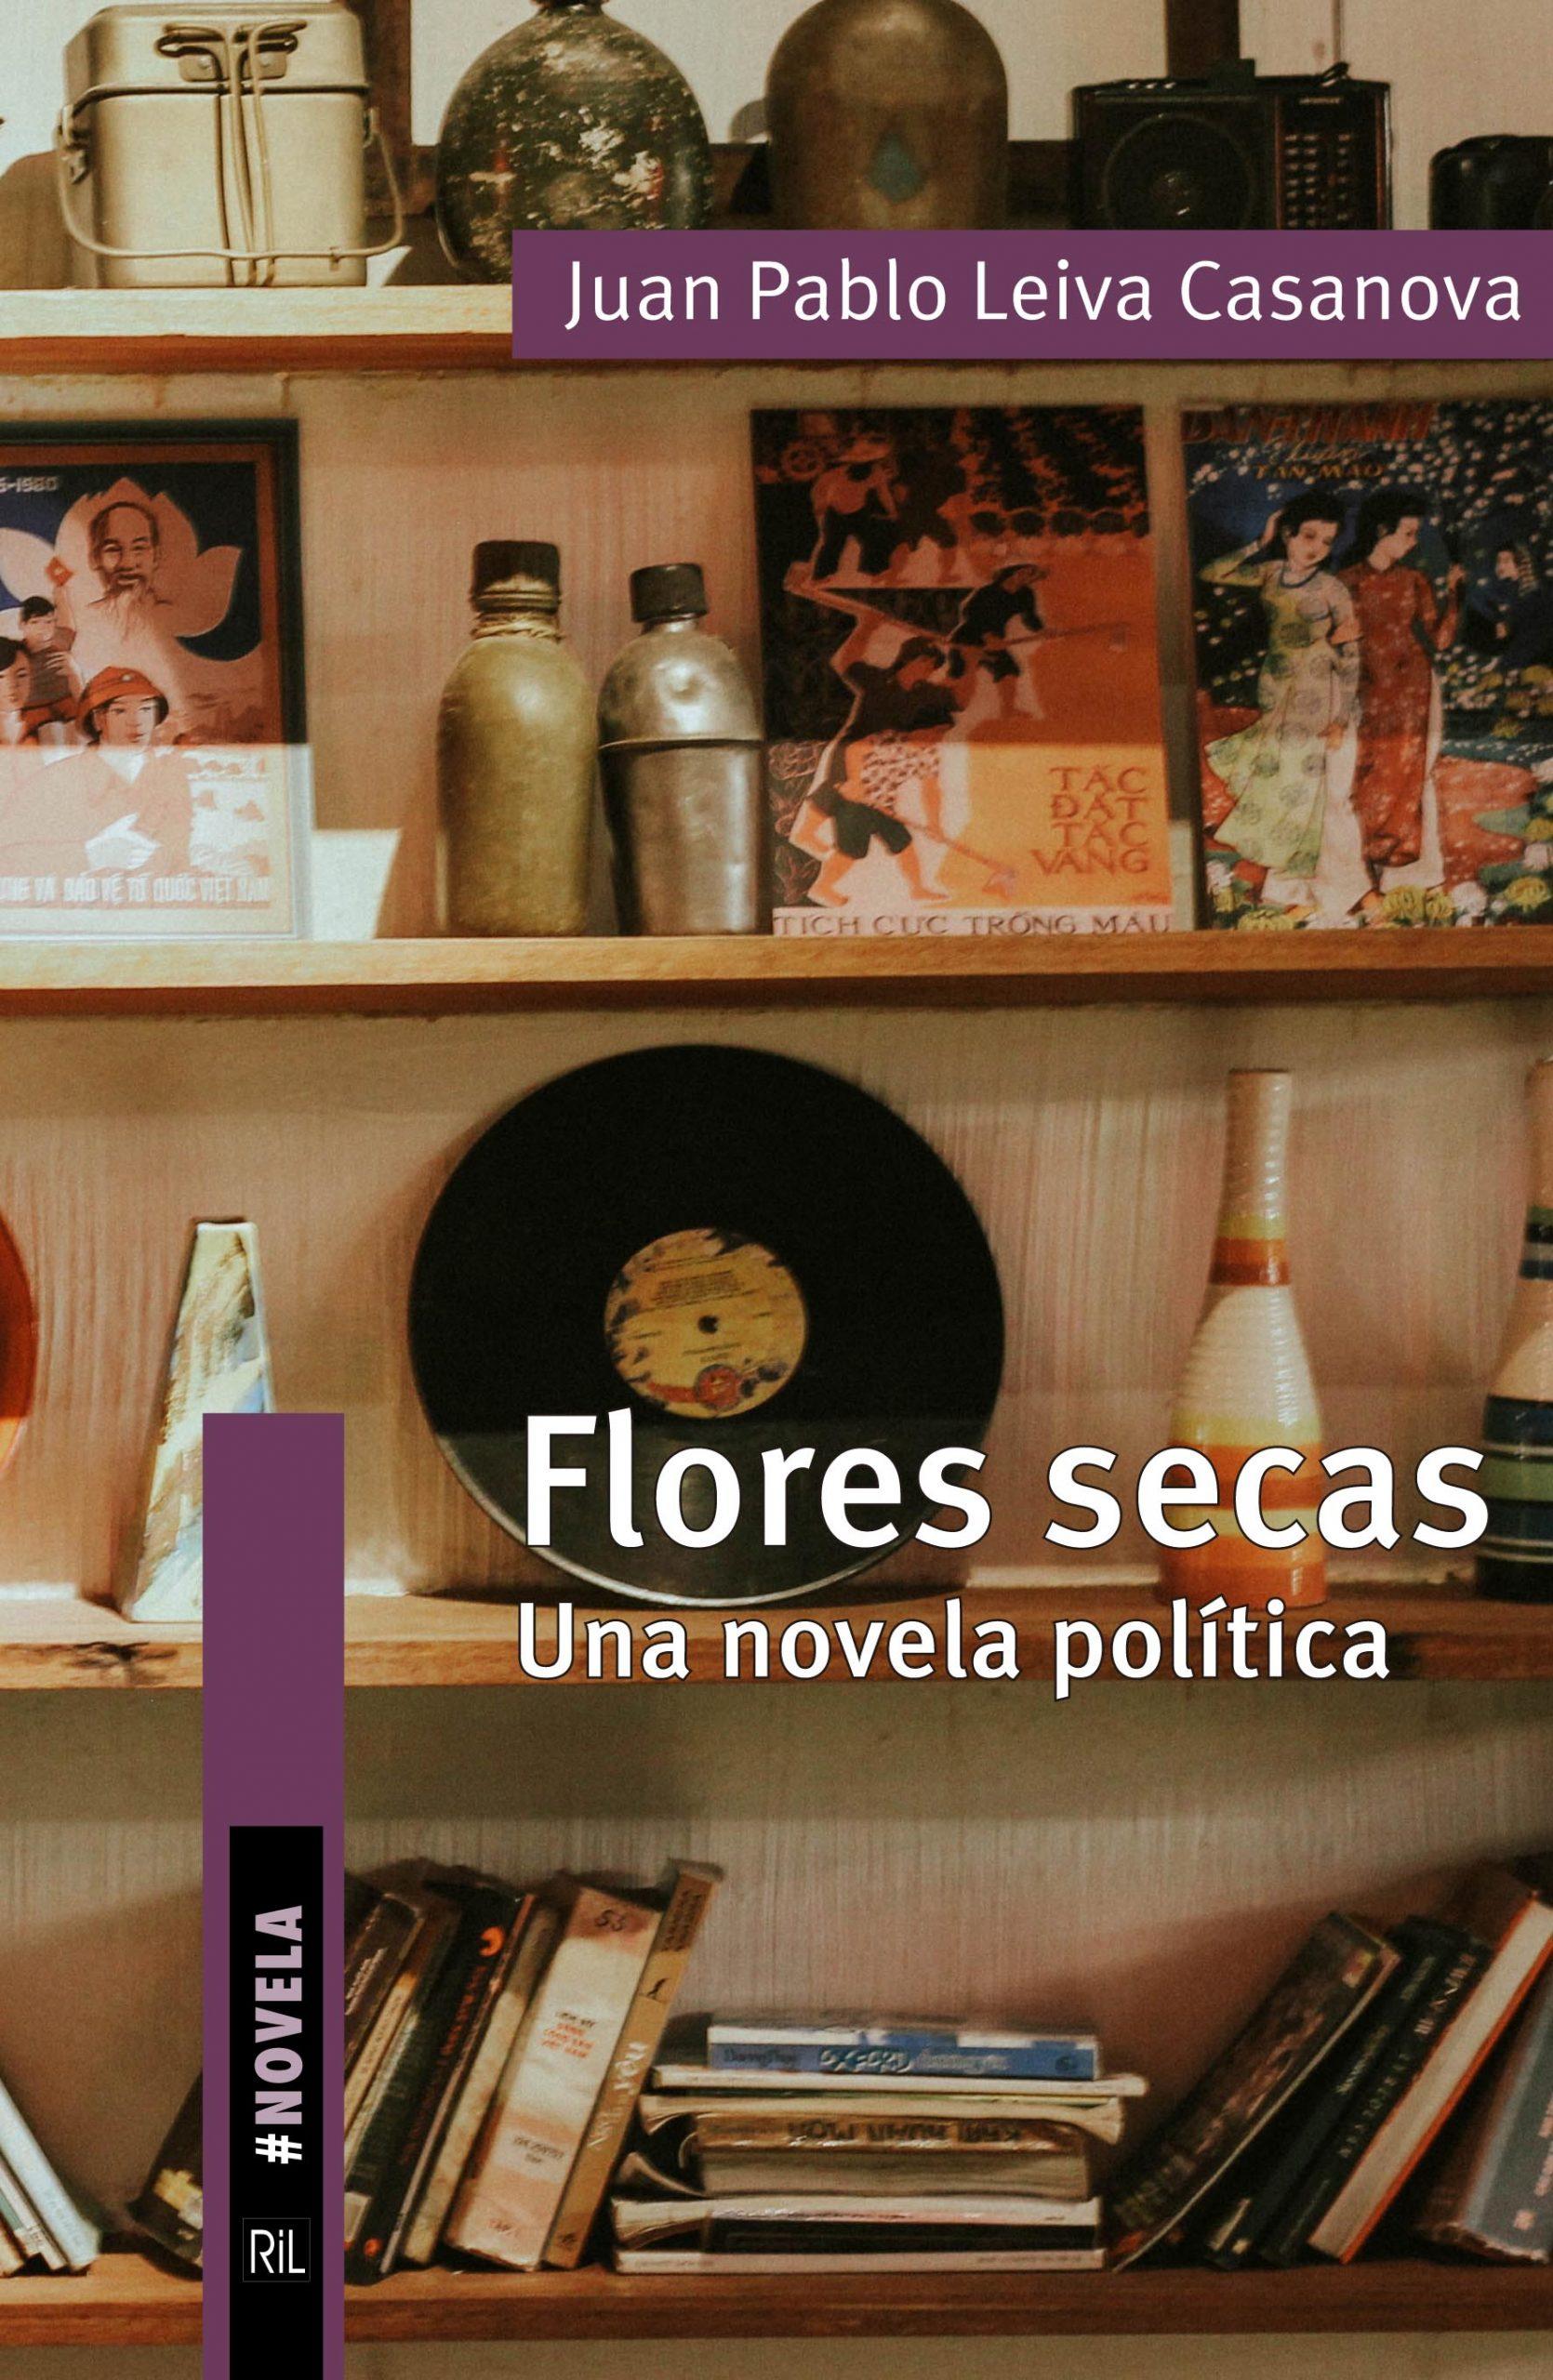 9788418982019-Leiva-Juan-Pablo-2021-Flores-secas-1-scaled-1.jpg